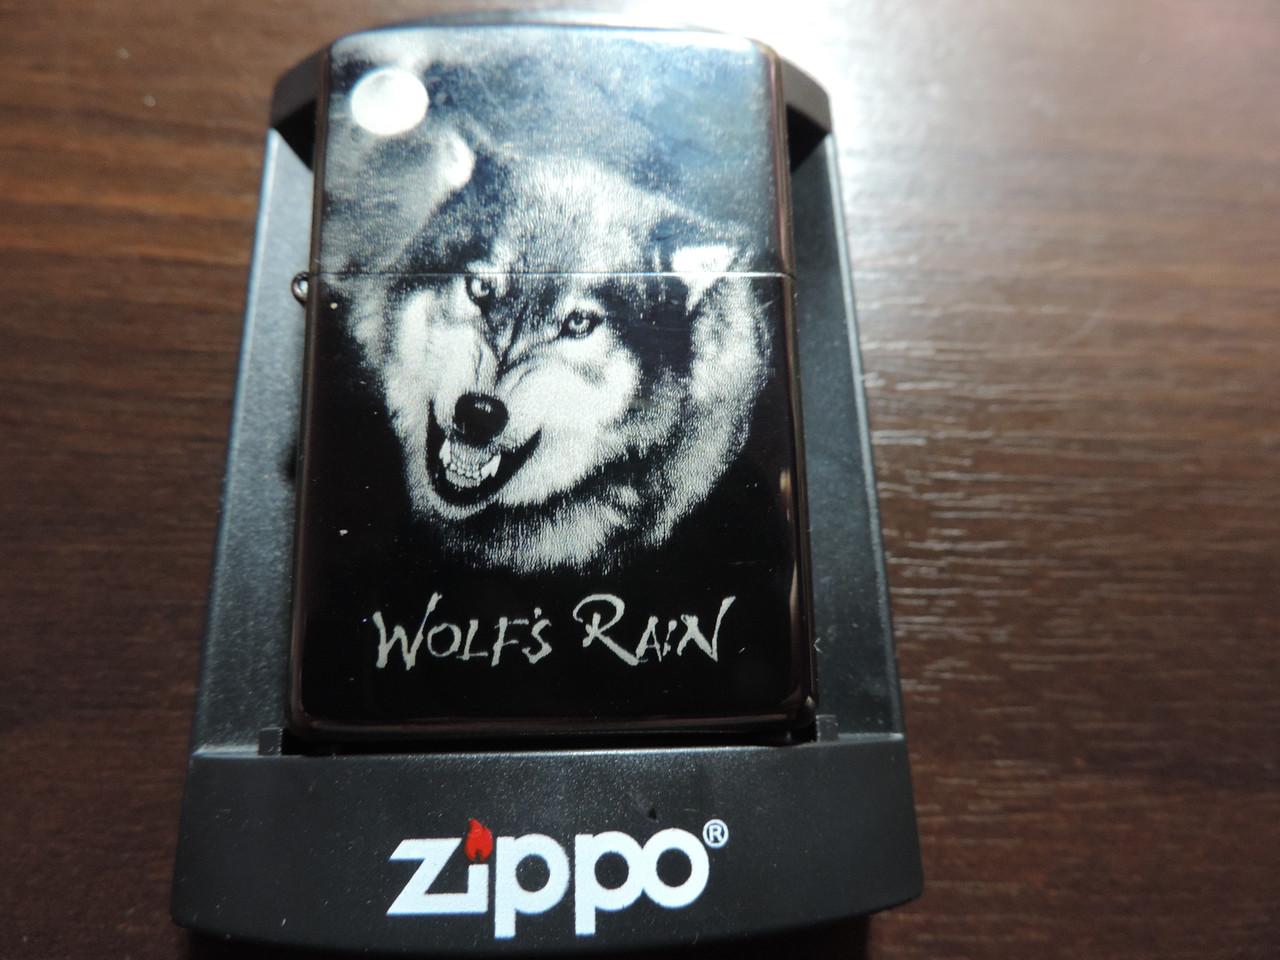 Зажигалка Zippo «Wolfs rain» копия